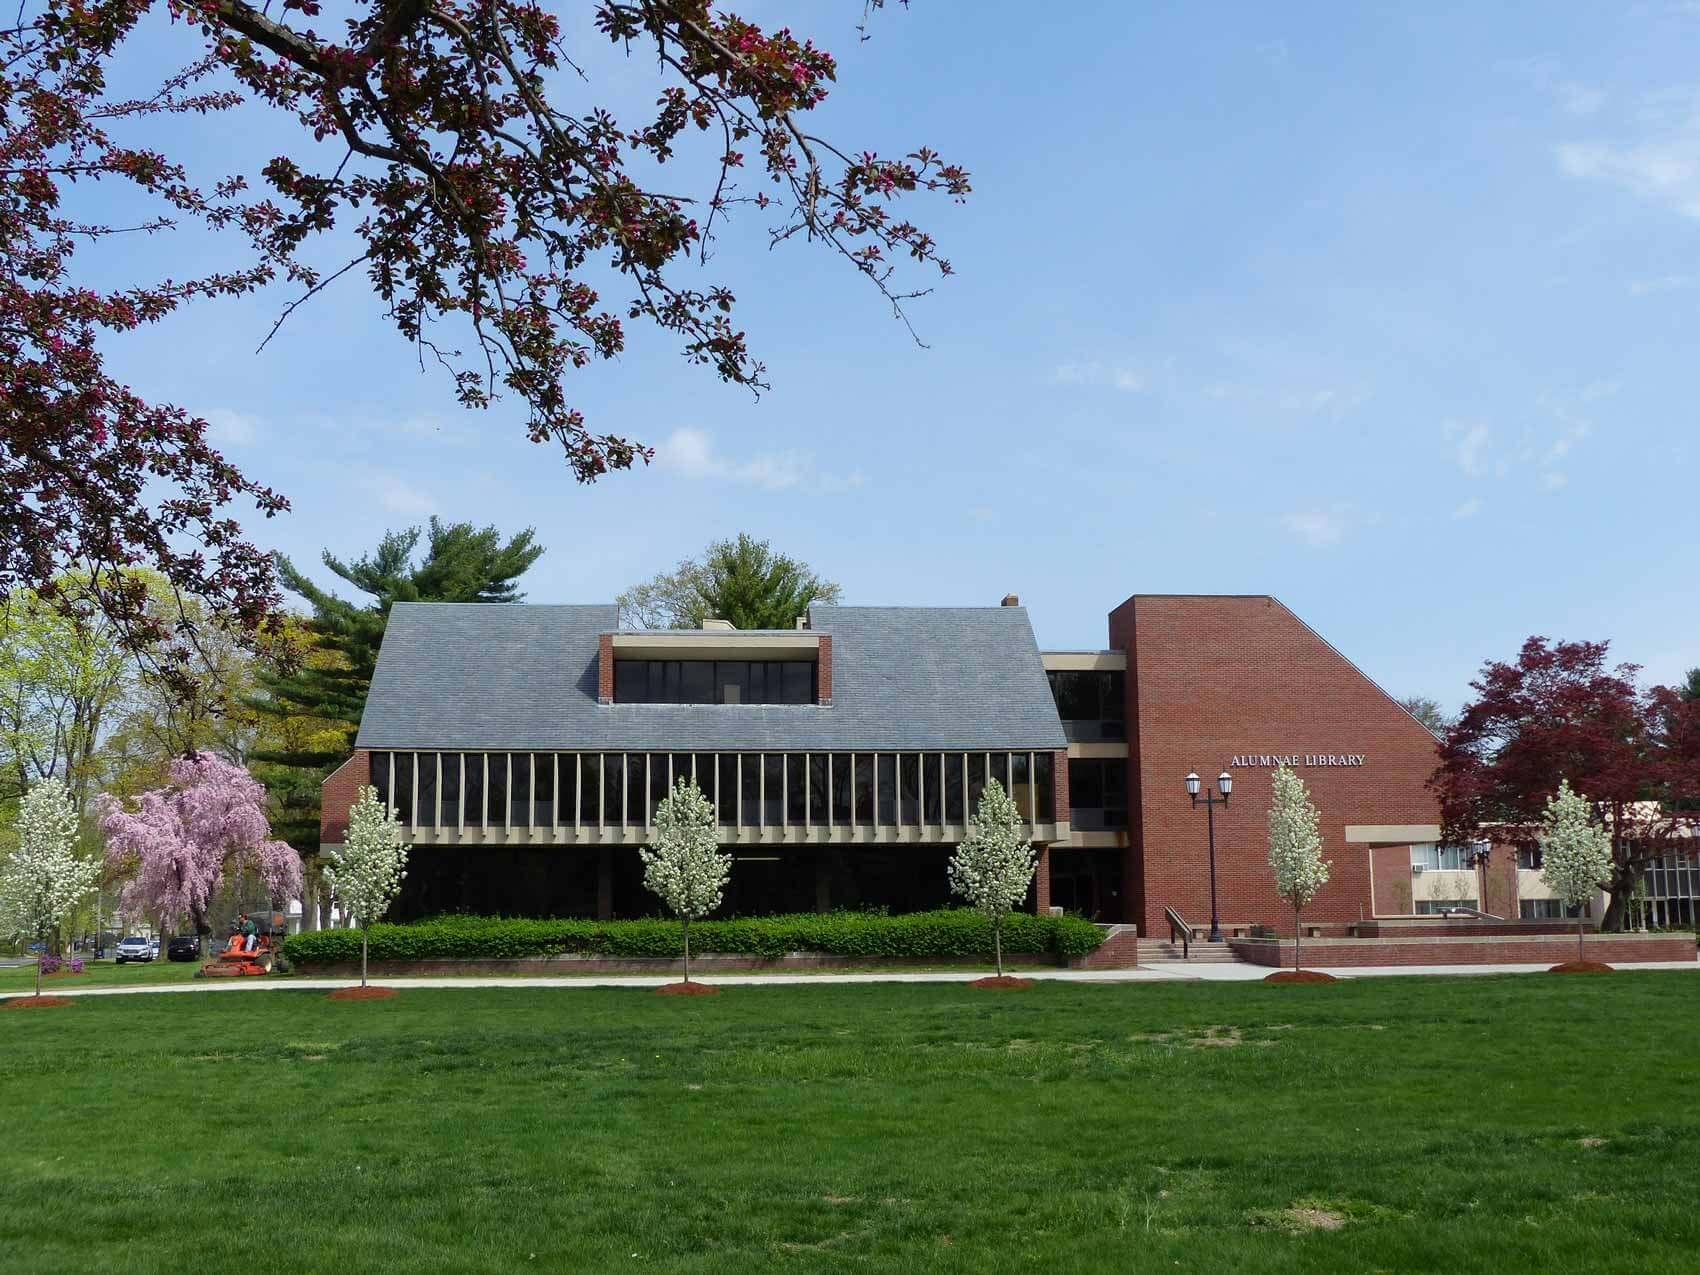 Alumnae Library 2016 Image